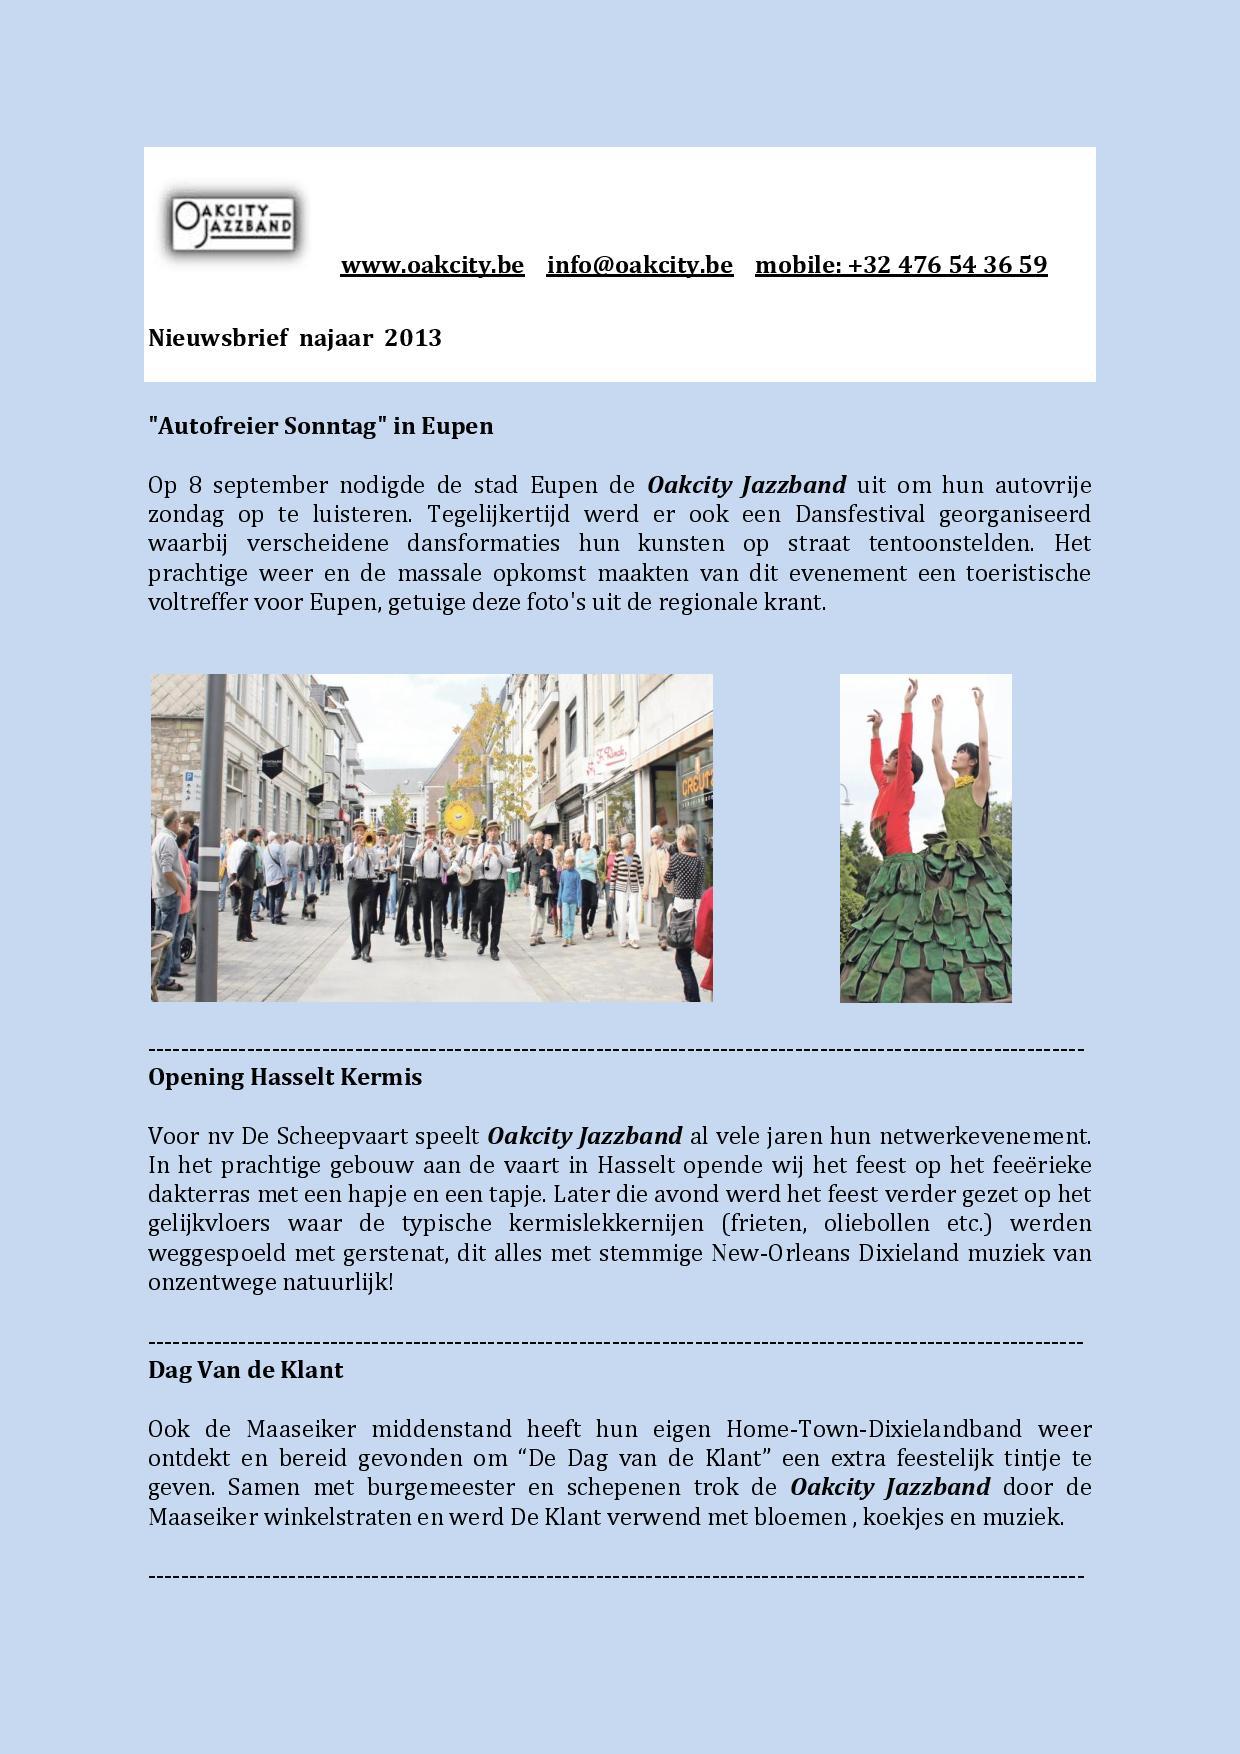 Nieuwsbrief Oakcity Jazzband najaar 2013-page-001